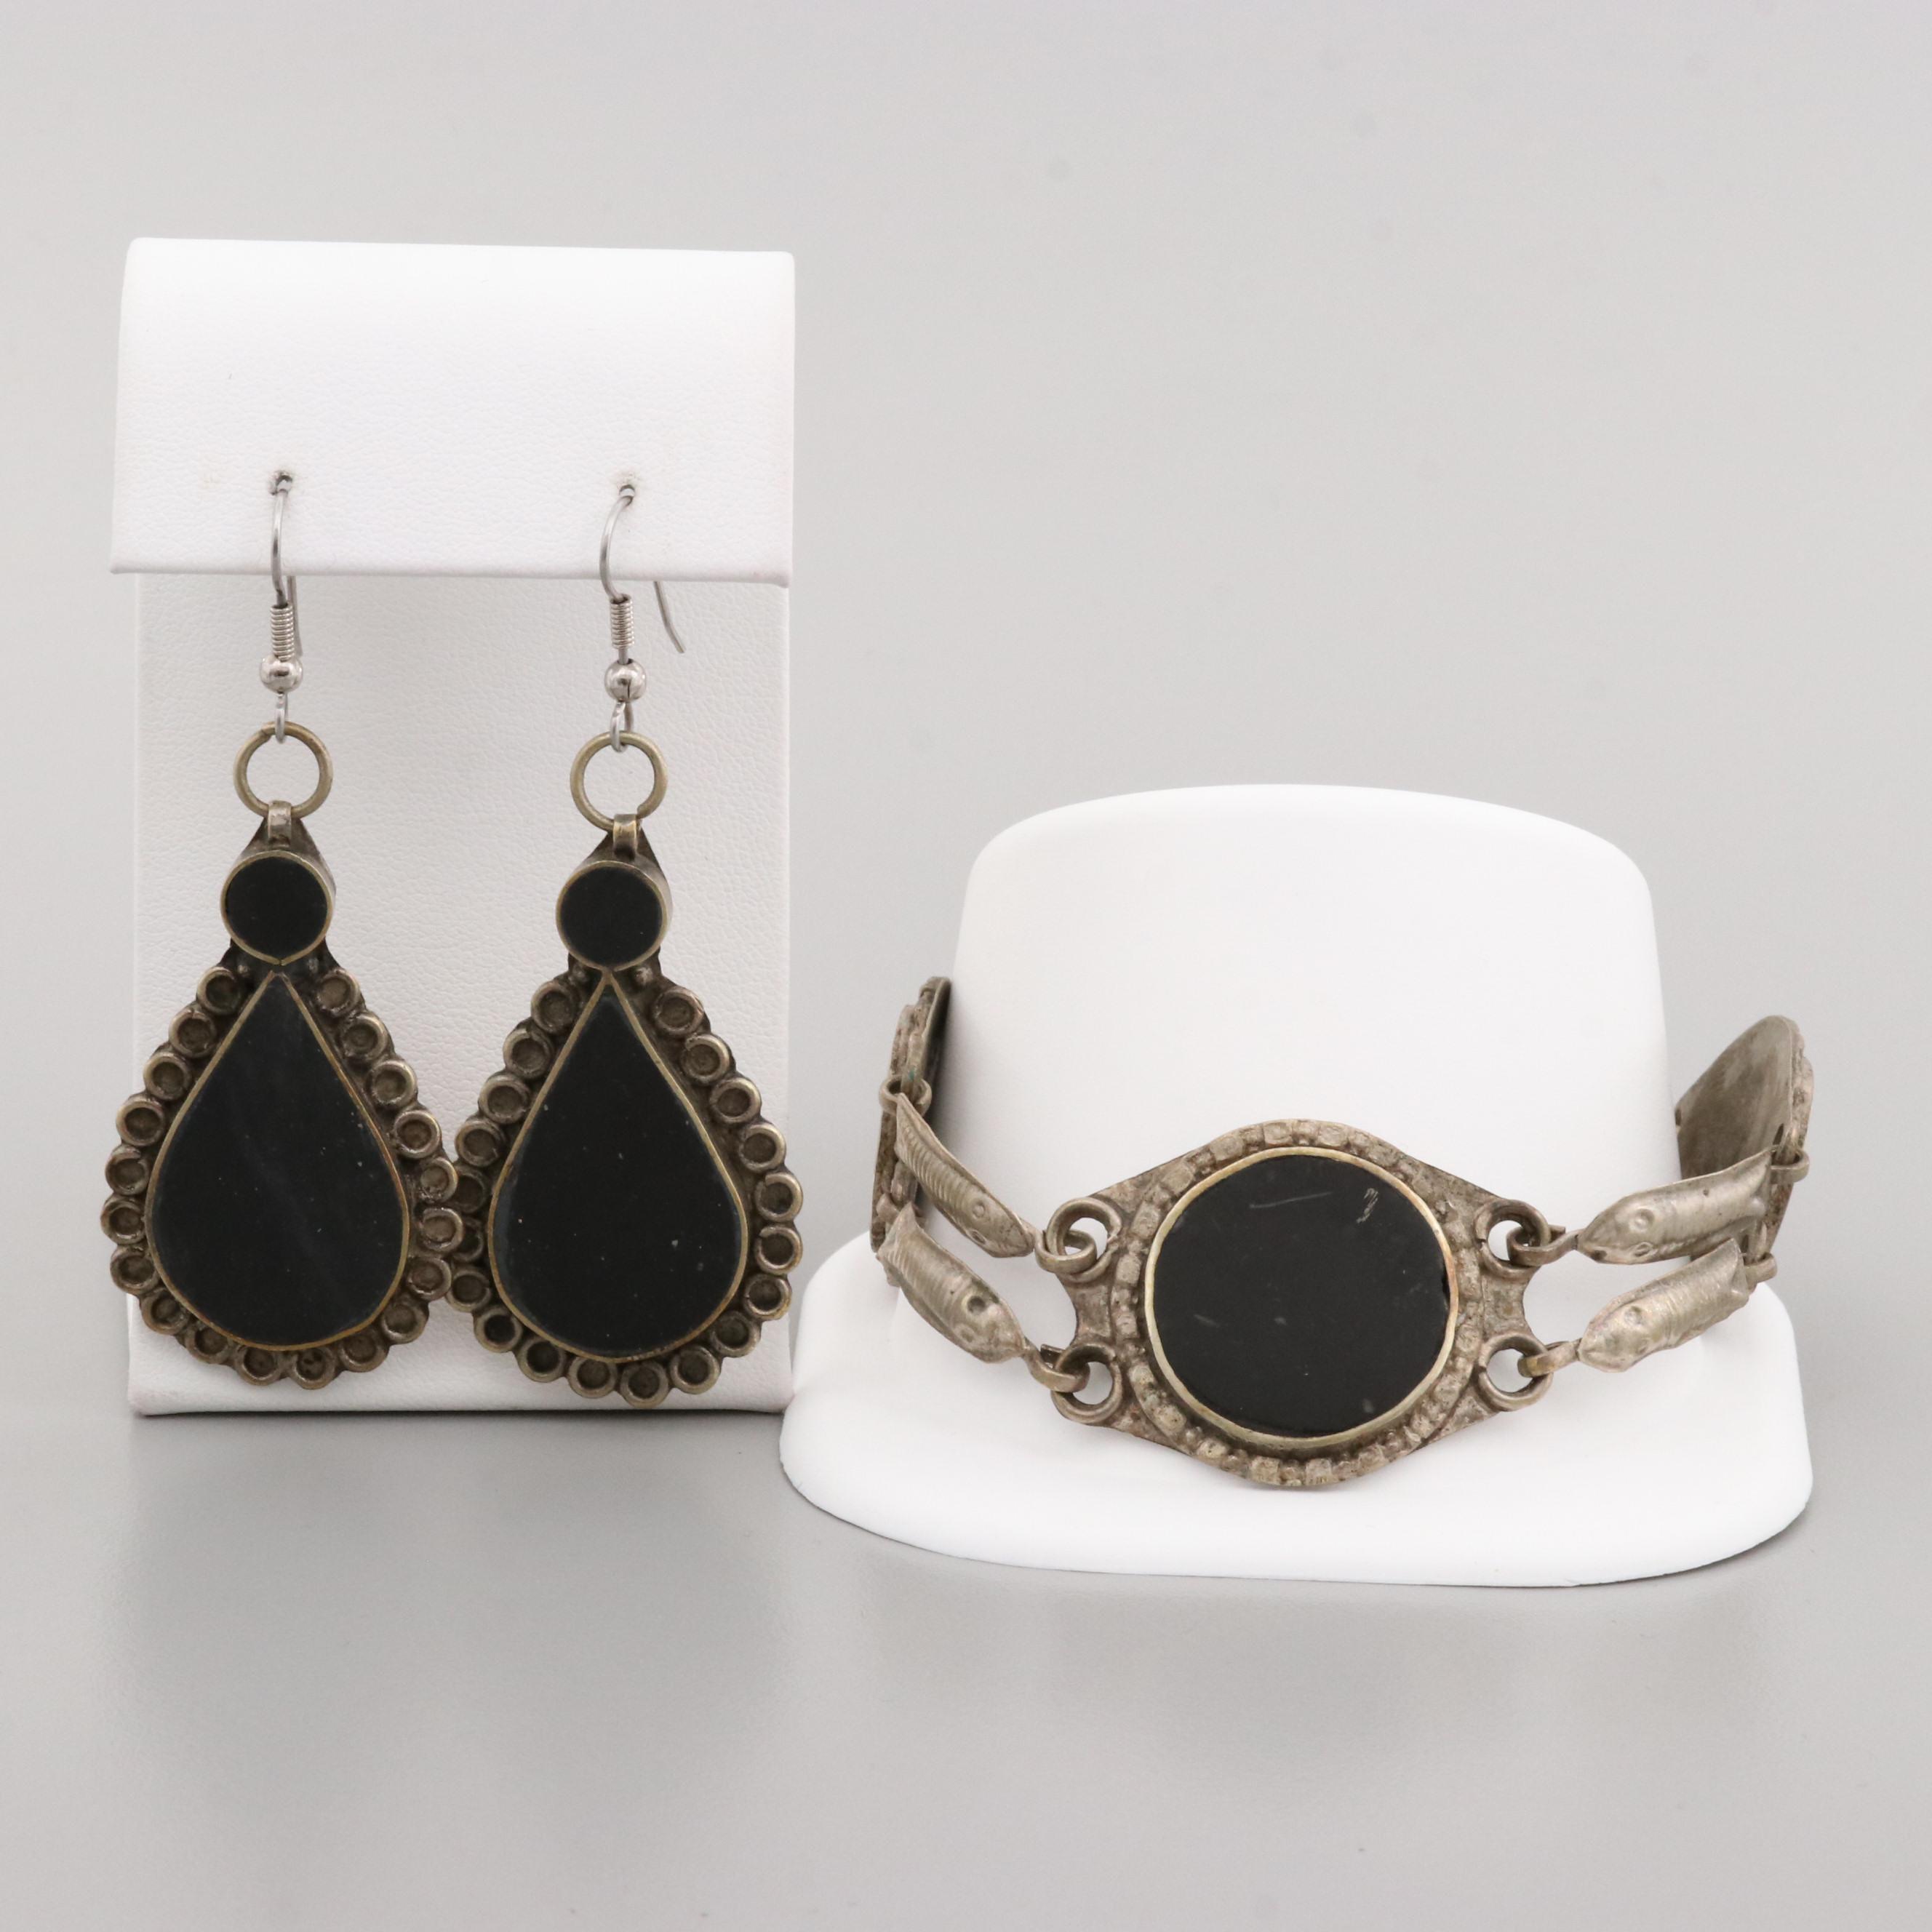 Silver Tone Fossiliferous Limestone Bracelet and Earring Set